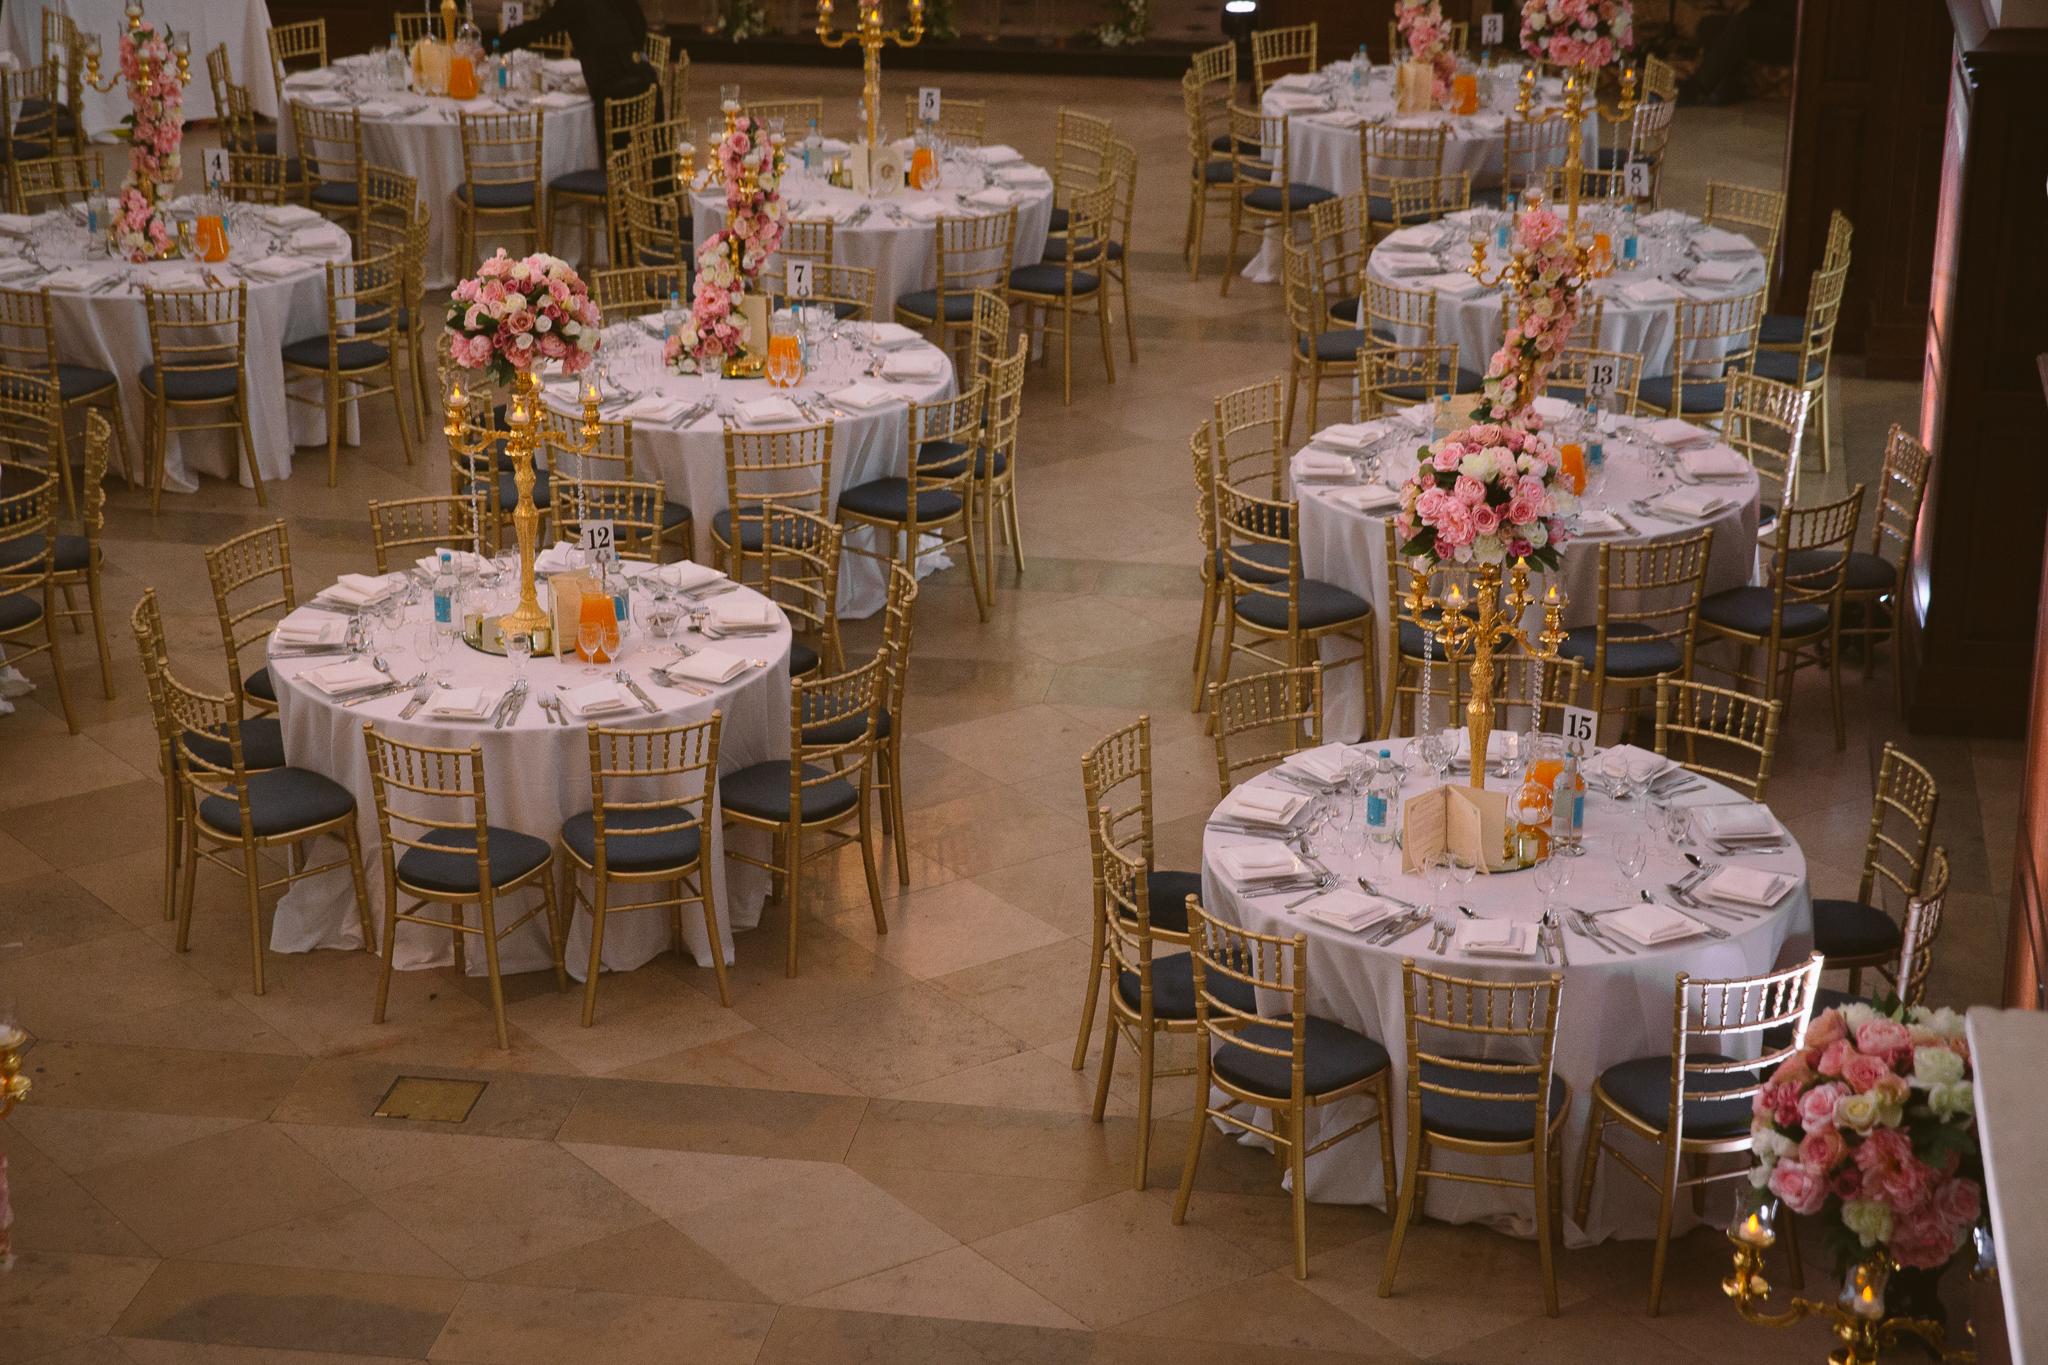 Asian-wedding-photographer-london-birmingham-Zohaib Ali5.jpg